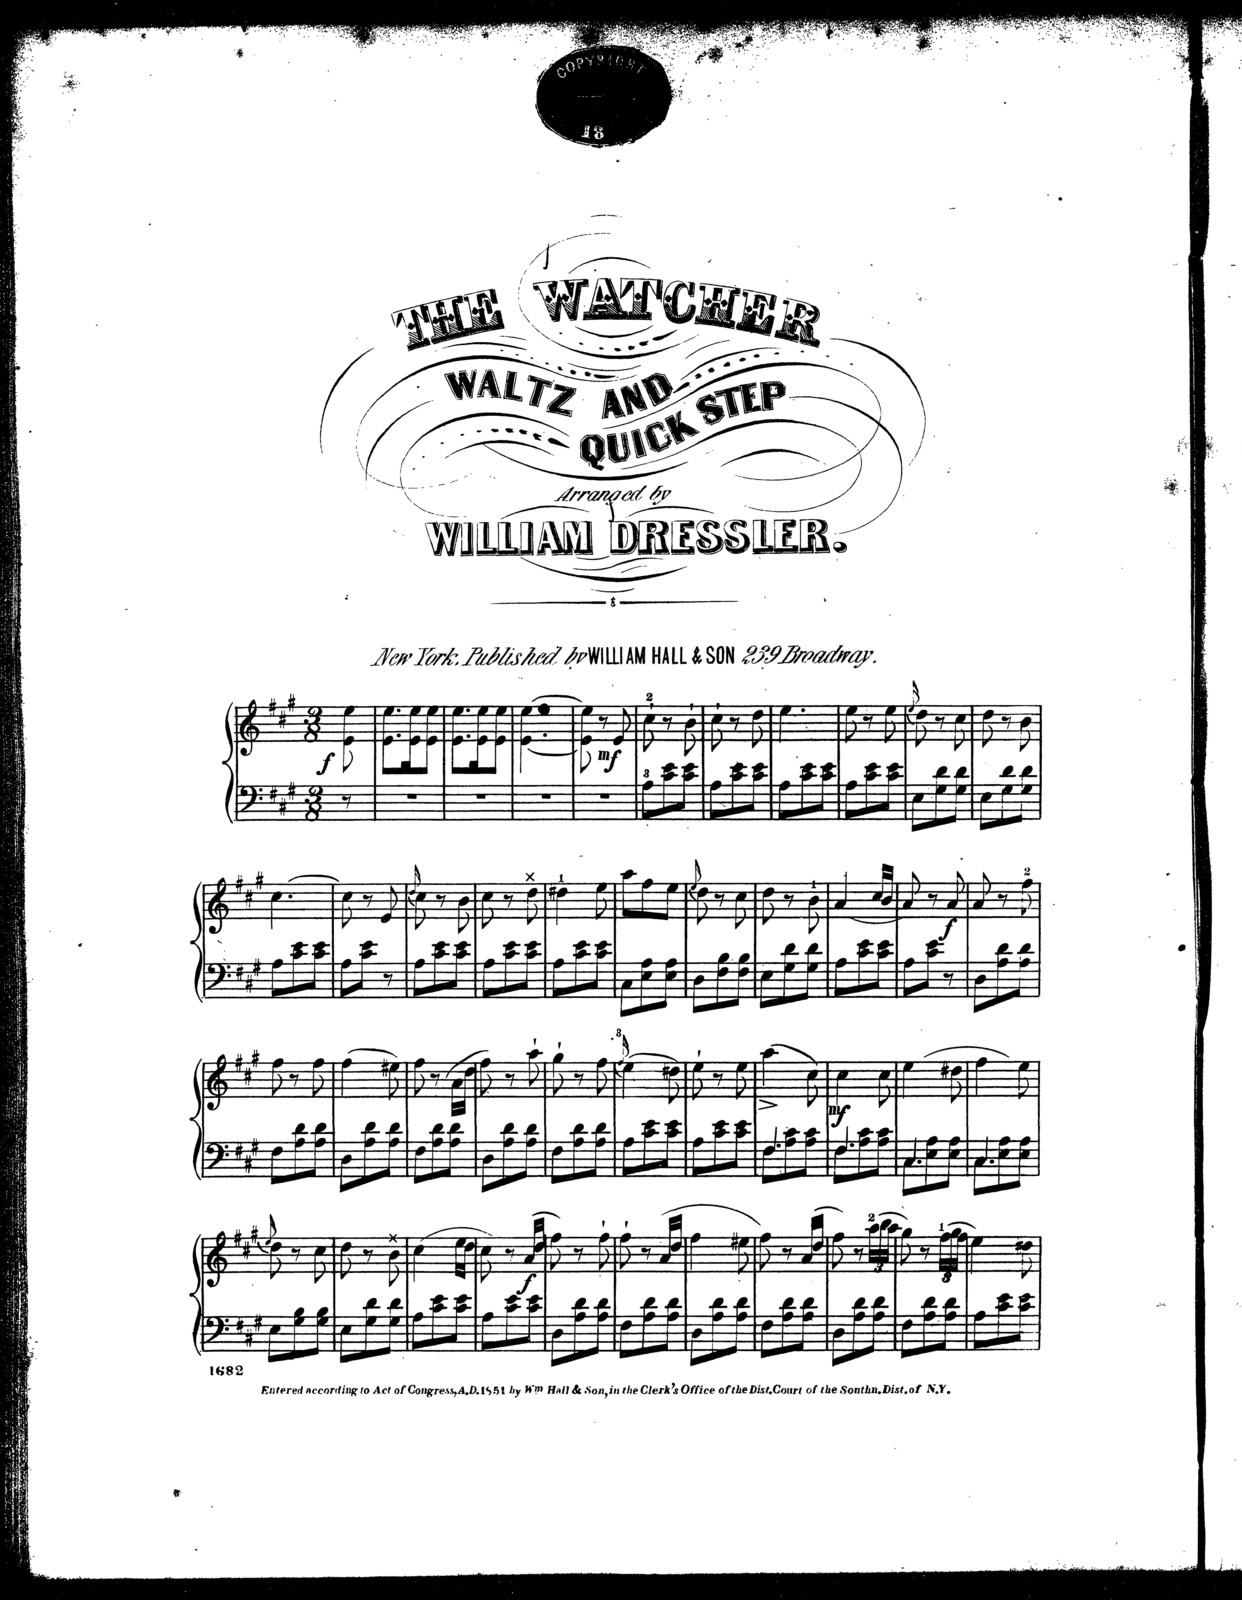 https://cdn4.picryl.com/photo/1851/01/01/the-watcher-waltz-and-quick-step-1600.jpg